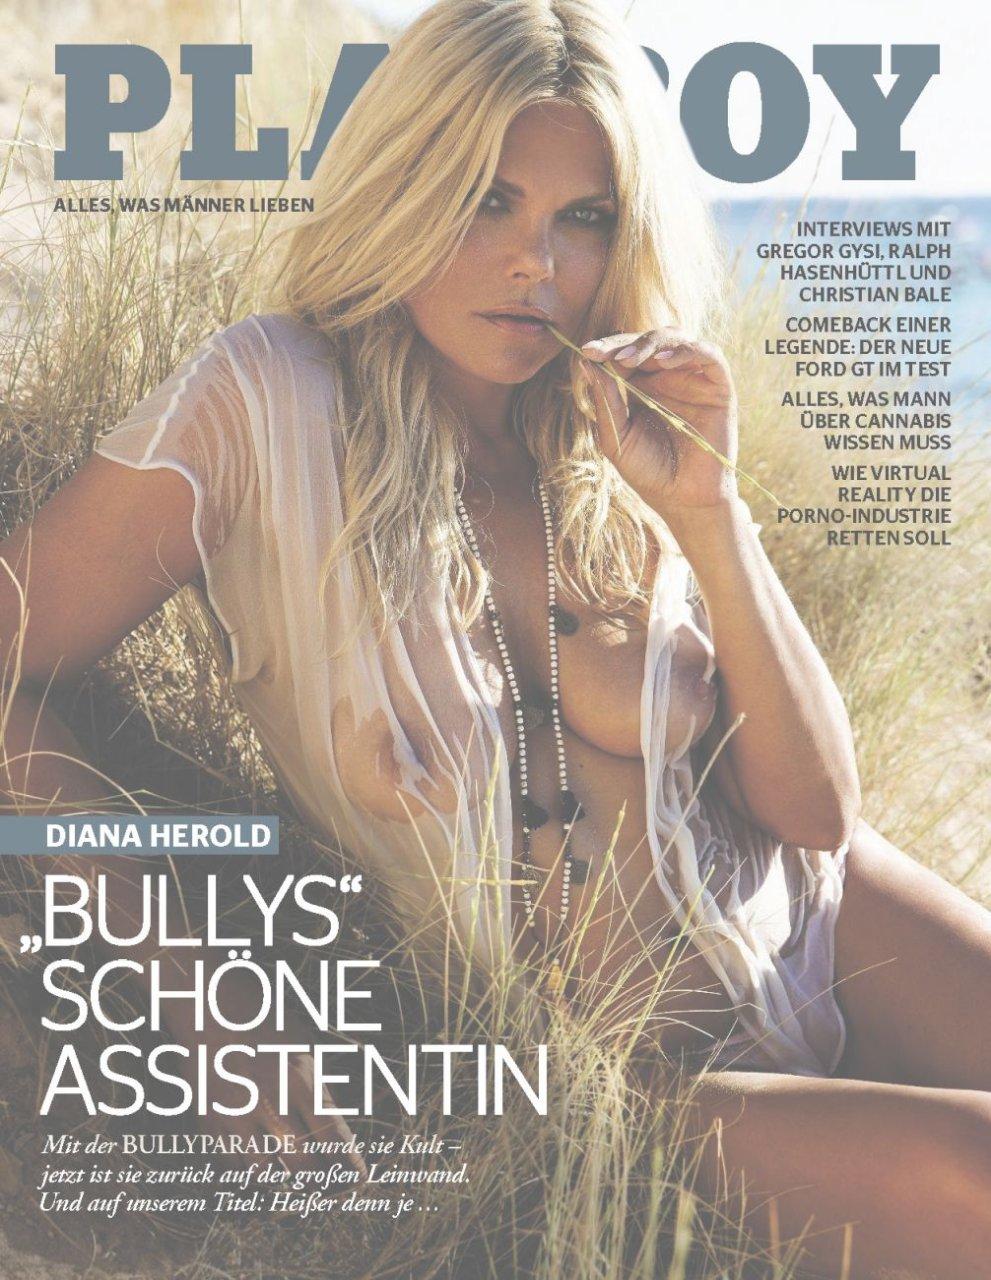 Jojo levesque sexy Adult pics & movies Kylie jenner nipples 7 Photos,Blanca blanco enjoys a day in malibu 27 Photos